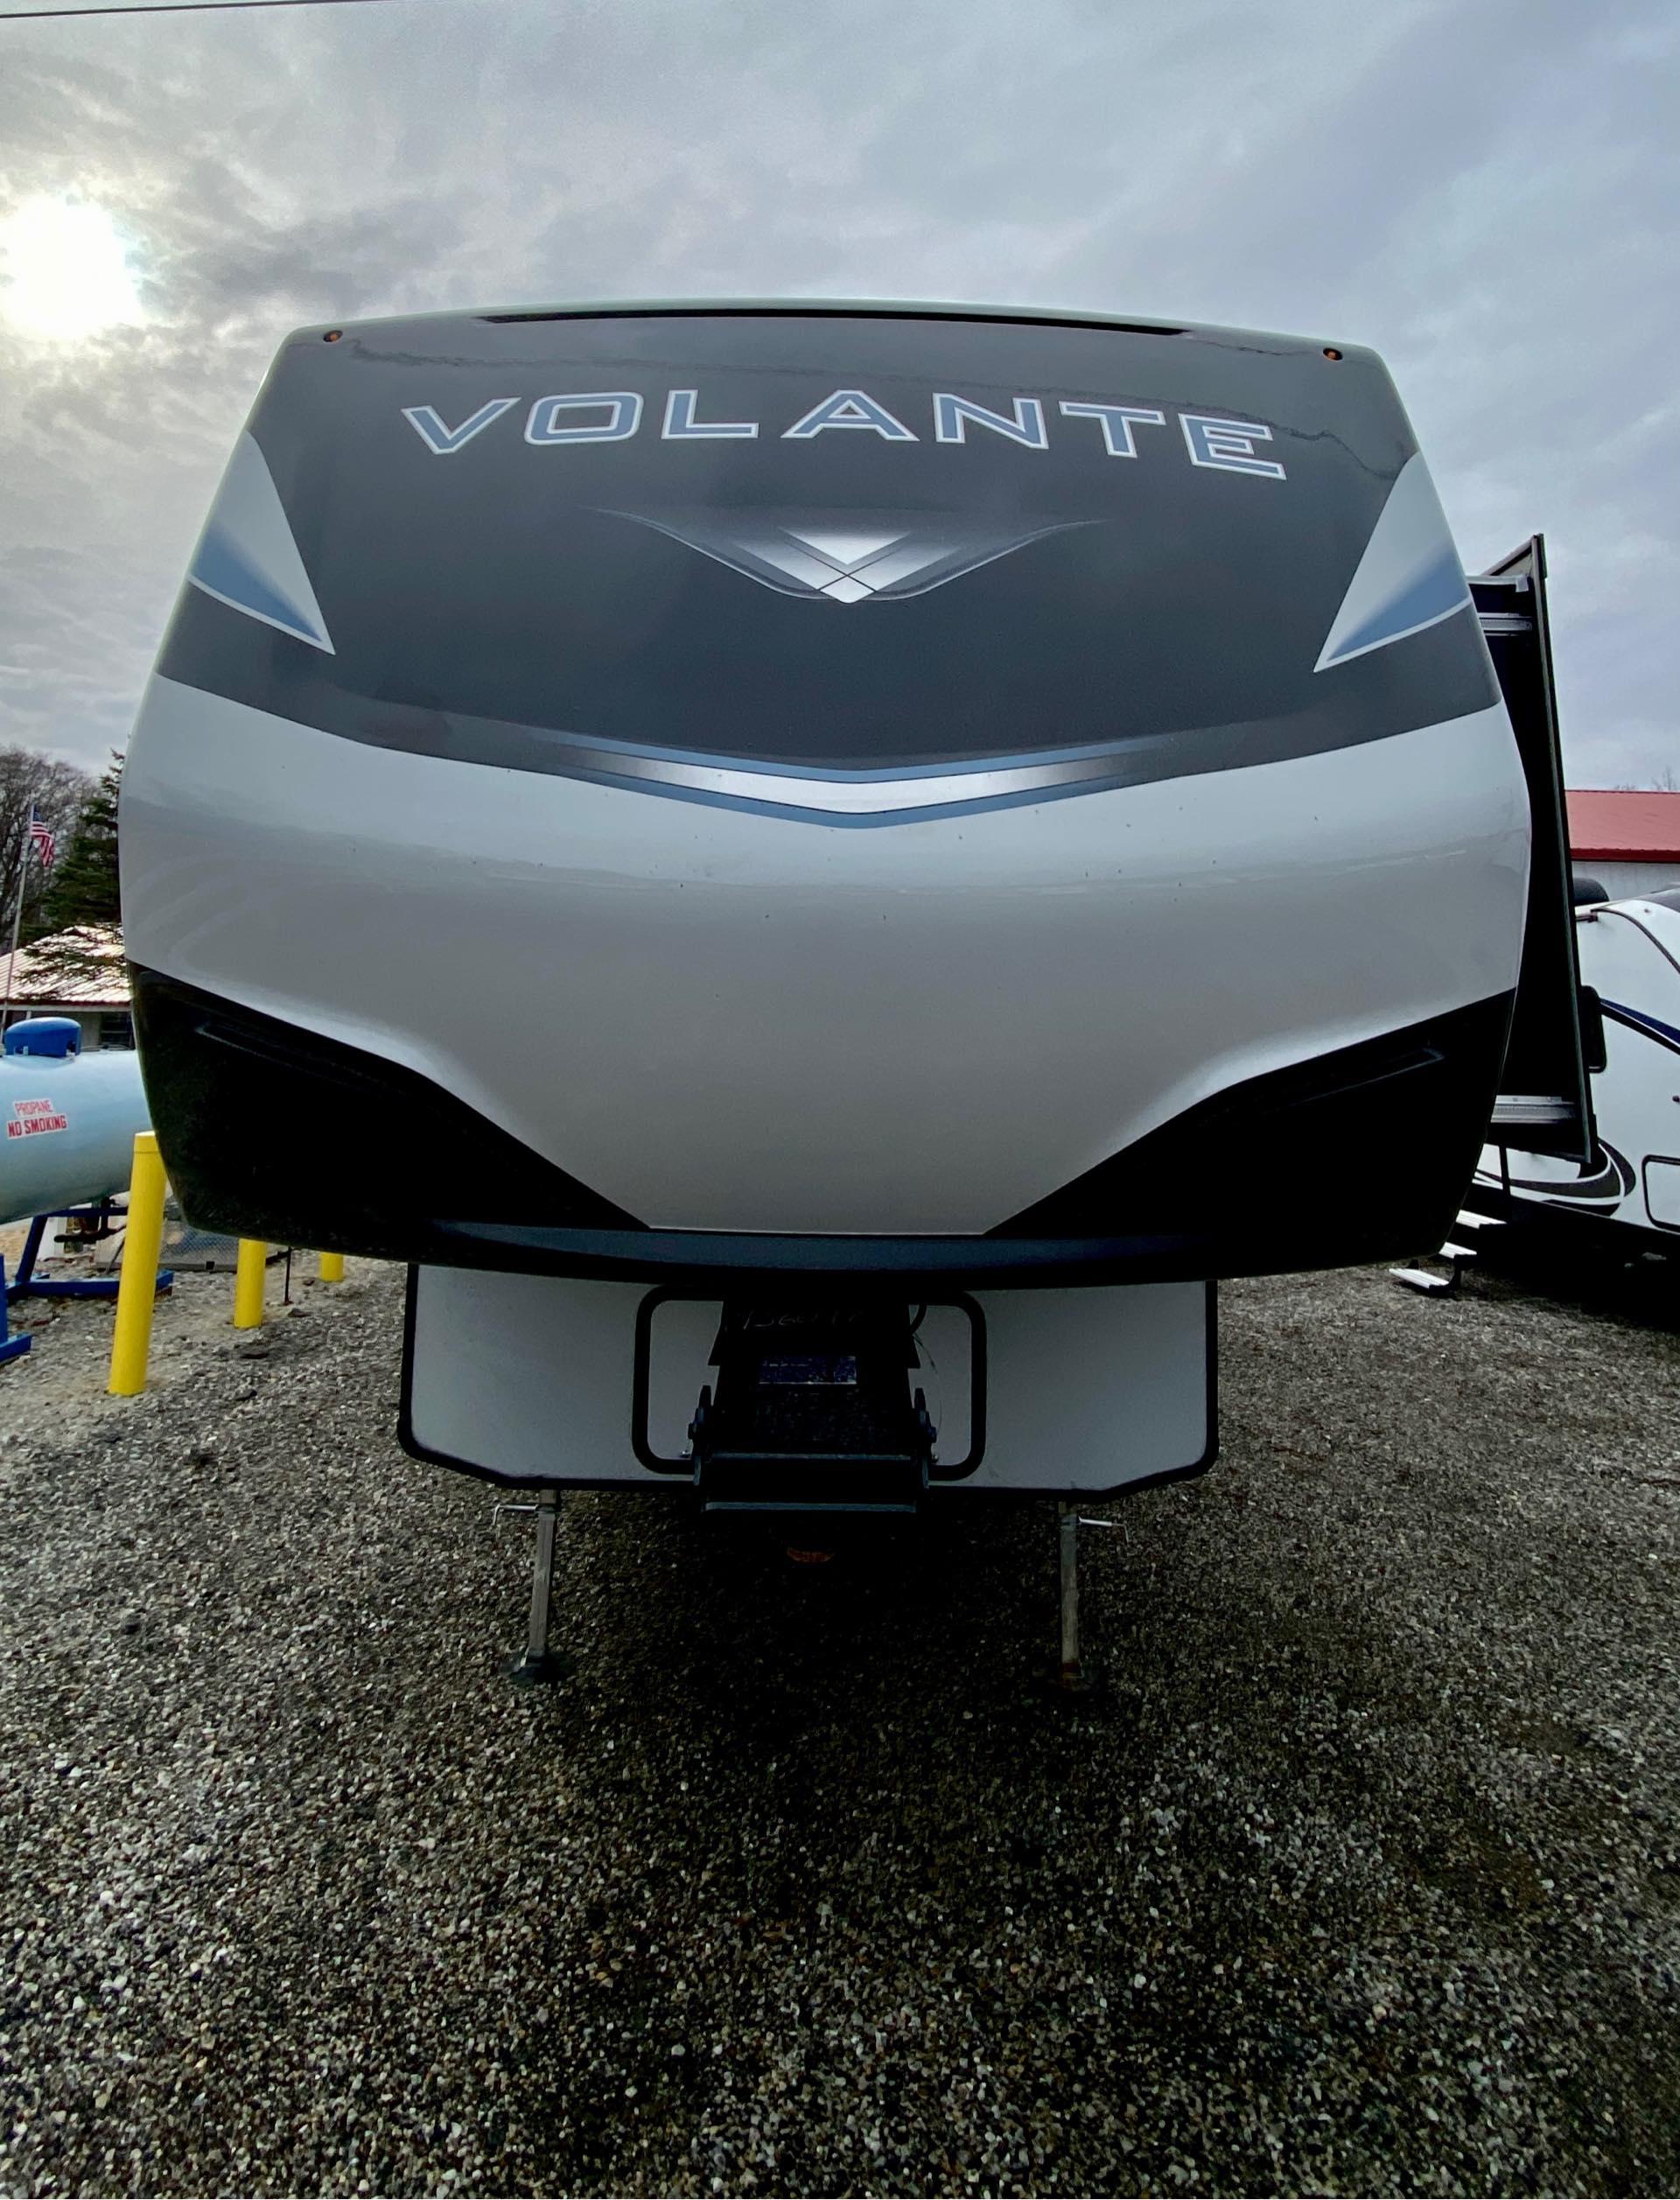 2021 CrossRoads Volante 5th Wheel VL3861BL High Profile at Lee's Country RV